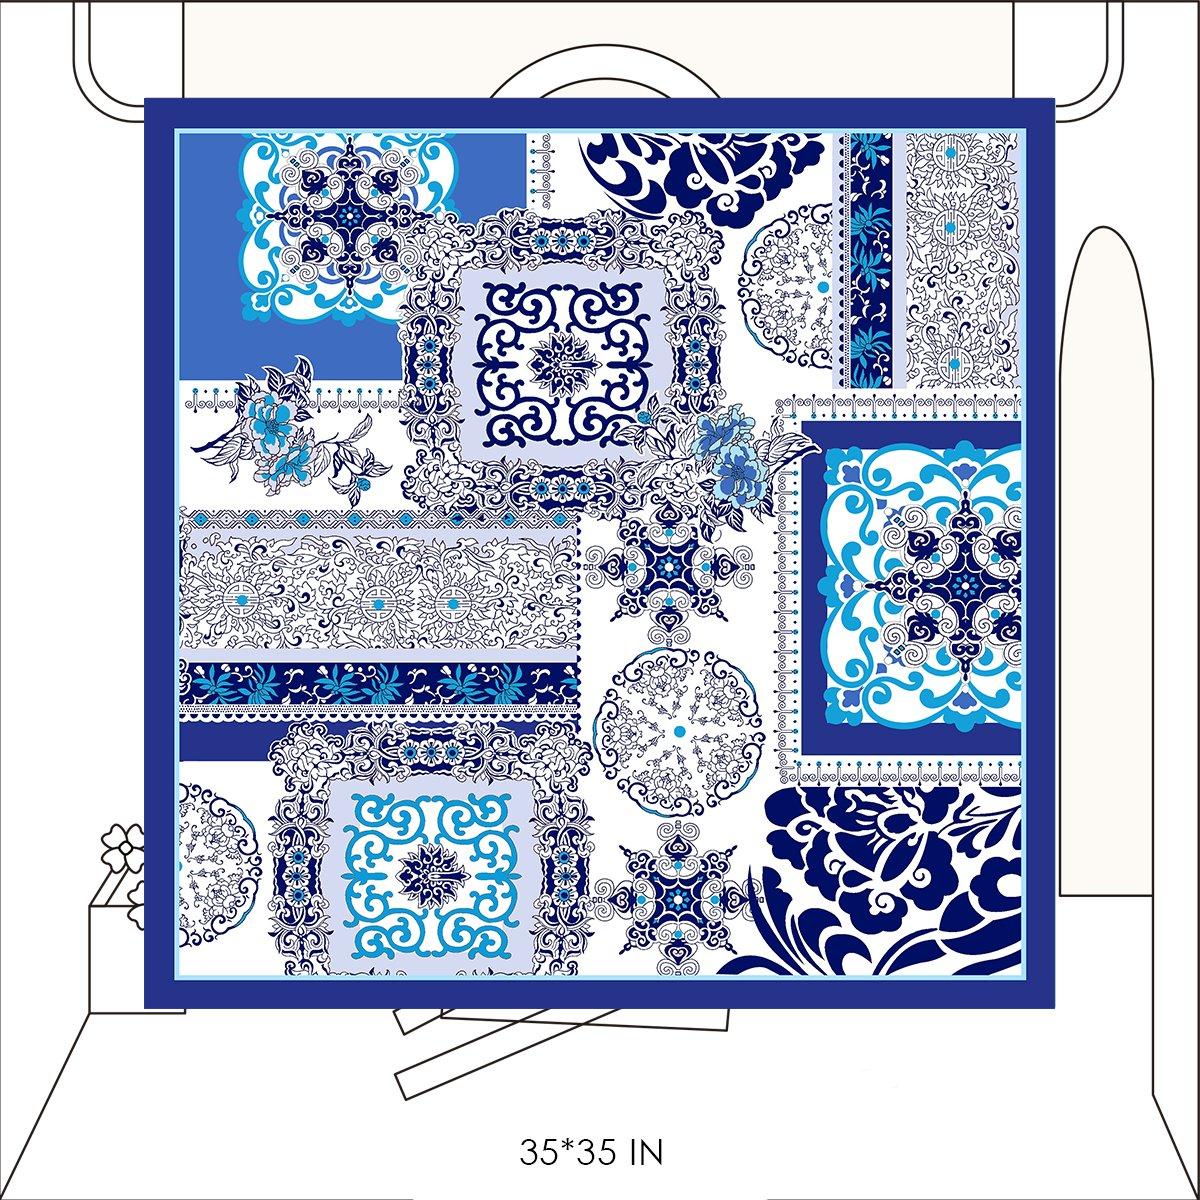 WENSLI Scarfs Lightweight Fashion Scarves Women Scarf Chiffon Scarves (White and dark blue)